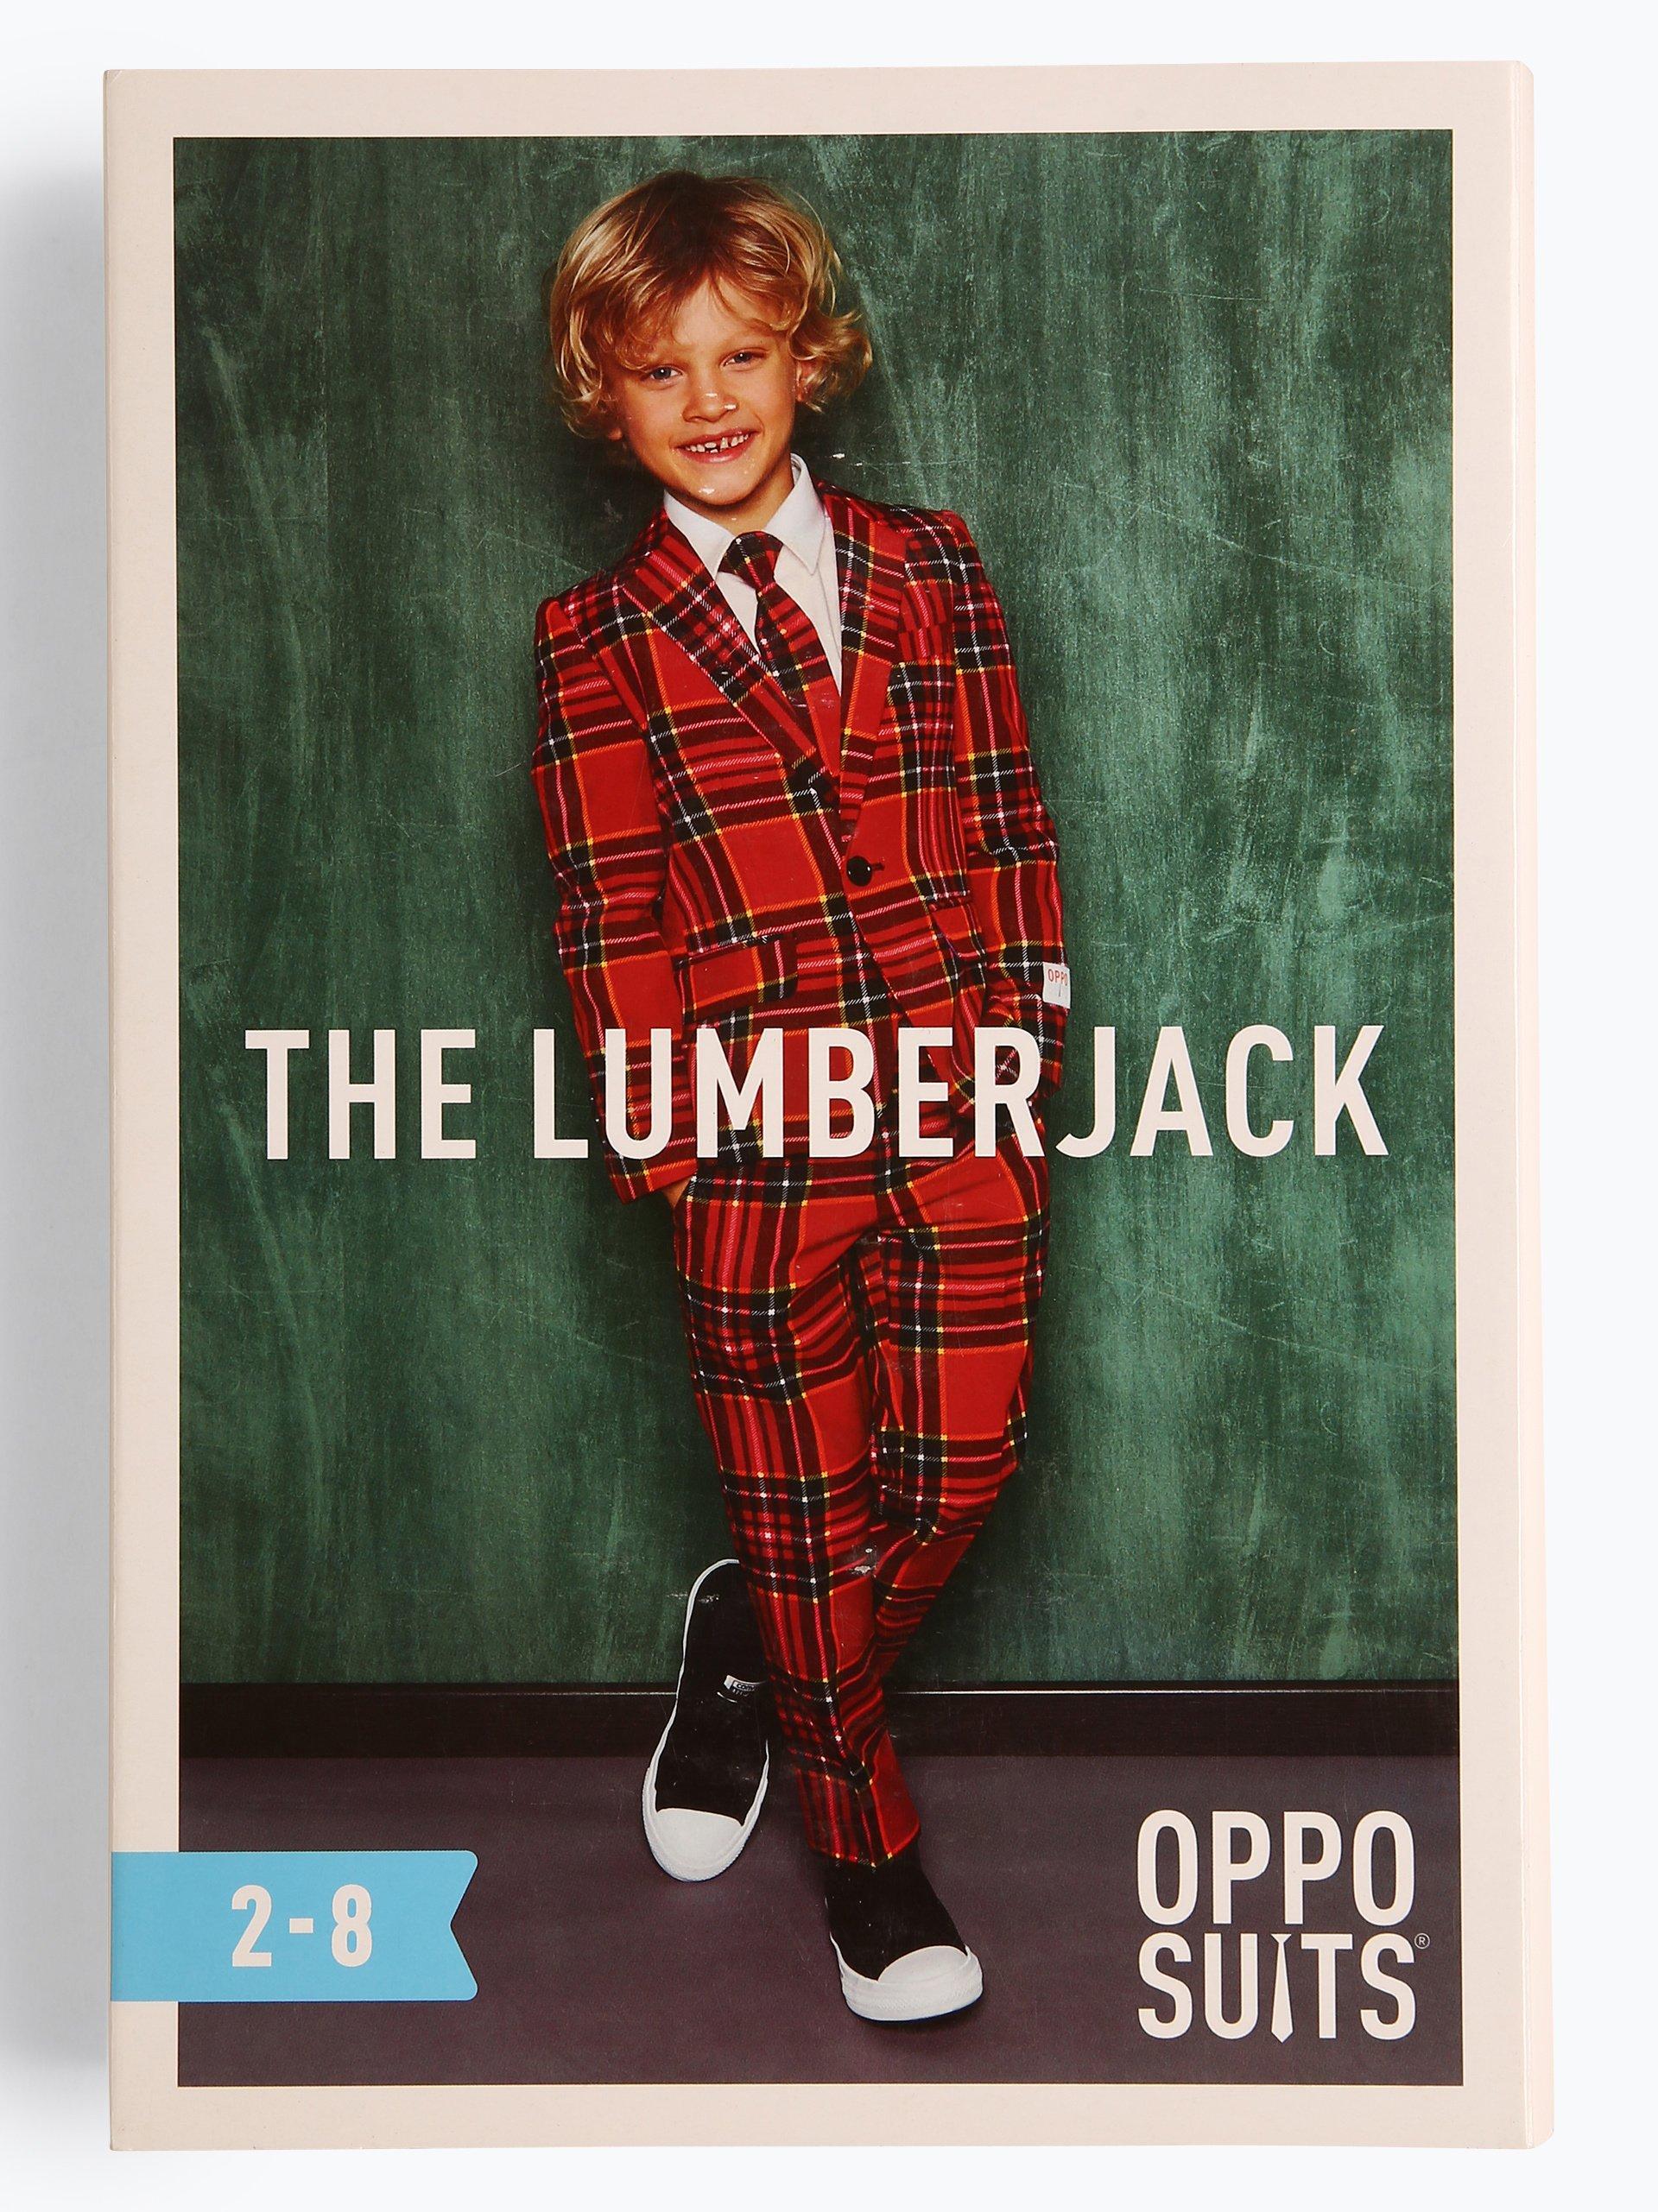 OppoSuits Jungen Anzug mit Krawatte - The Lumberjack